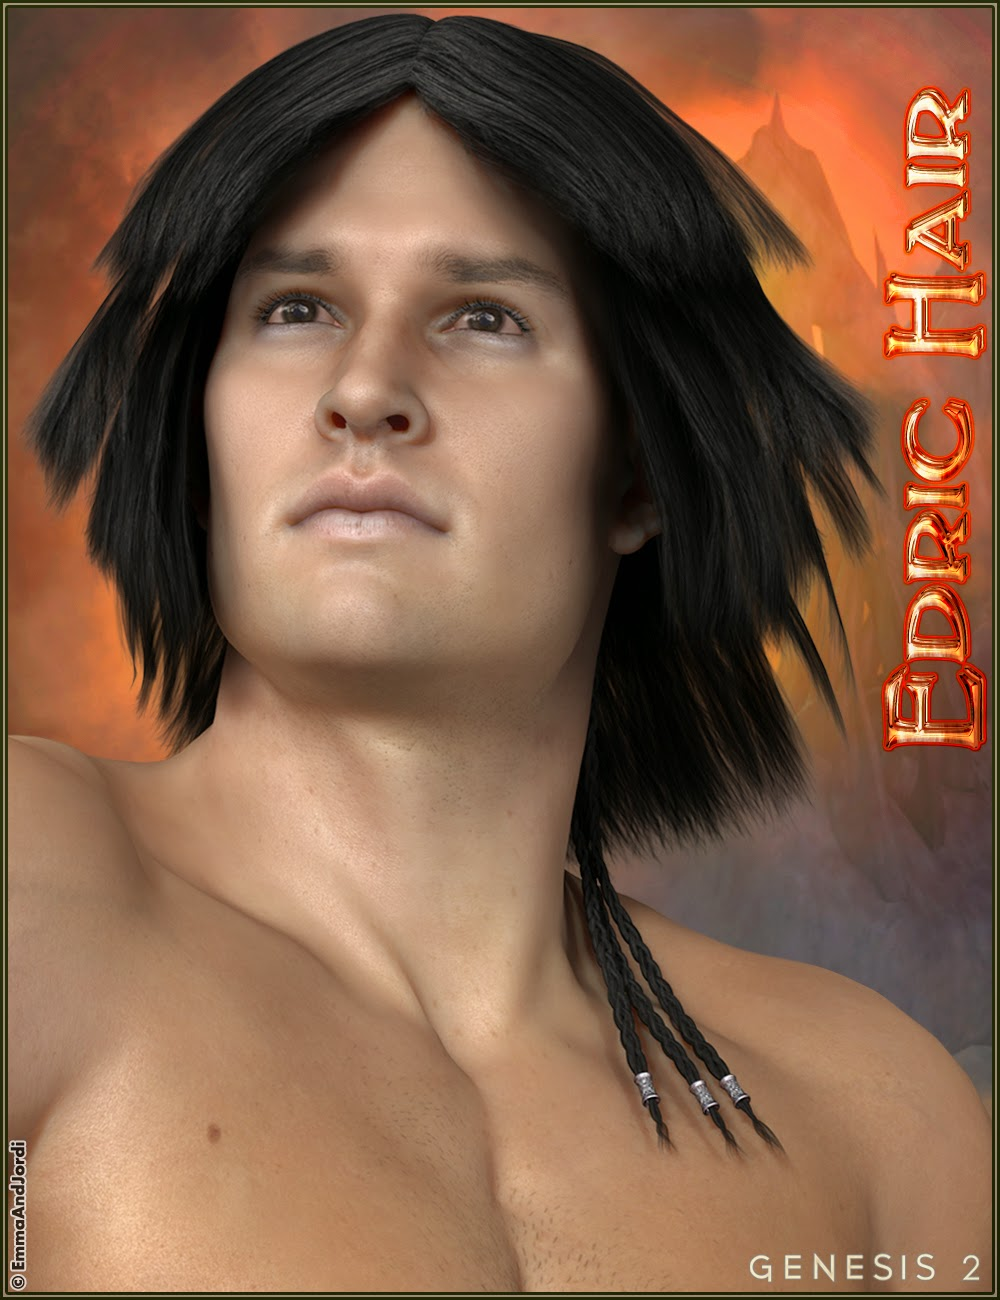 http://www.daz3d.com/edric-hair